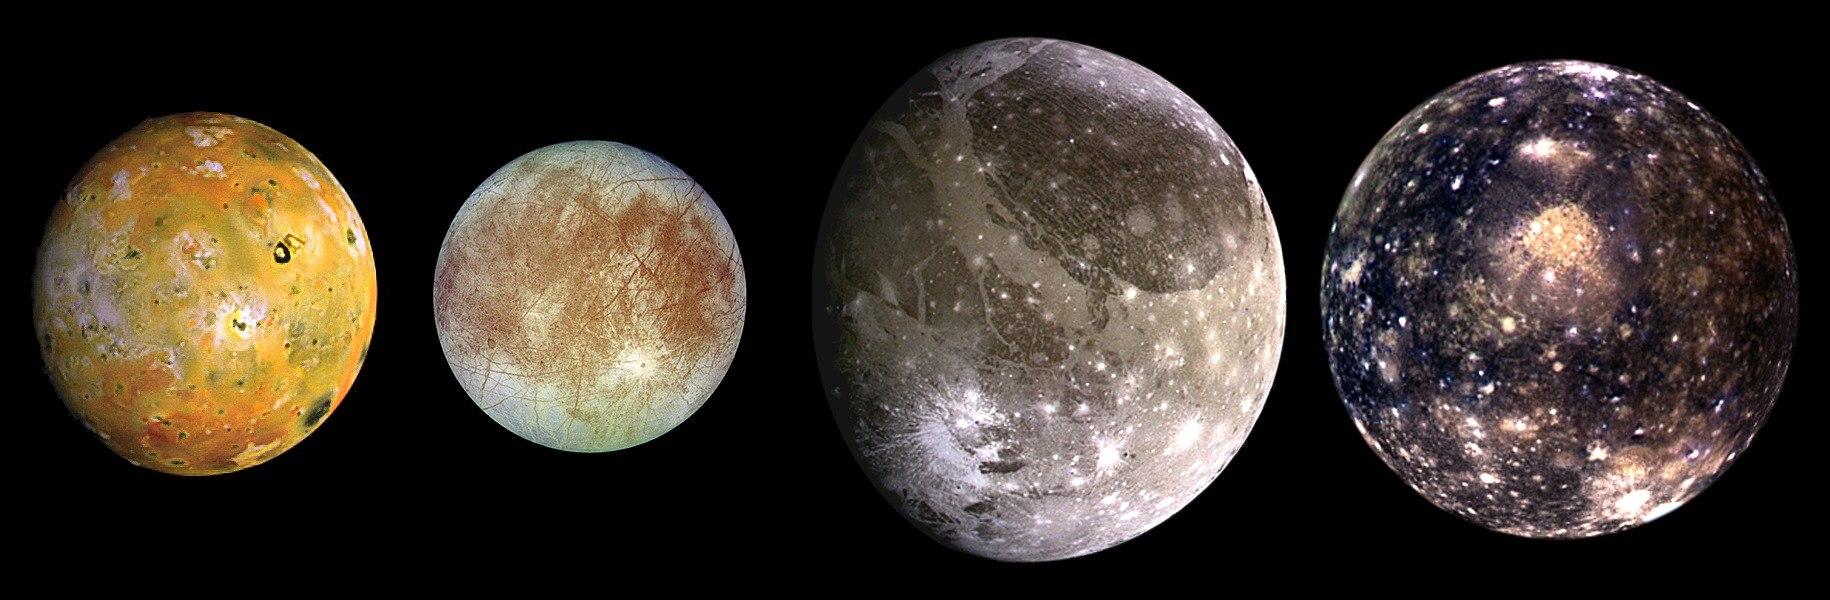 Галилеевы спутники Юпитера. Слева направо, в порядке удаления от Юпитера: Ио, Европа, Ганимед, Каллисто